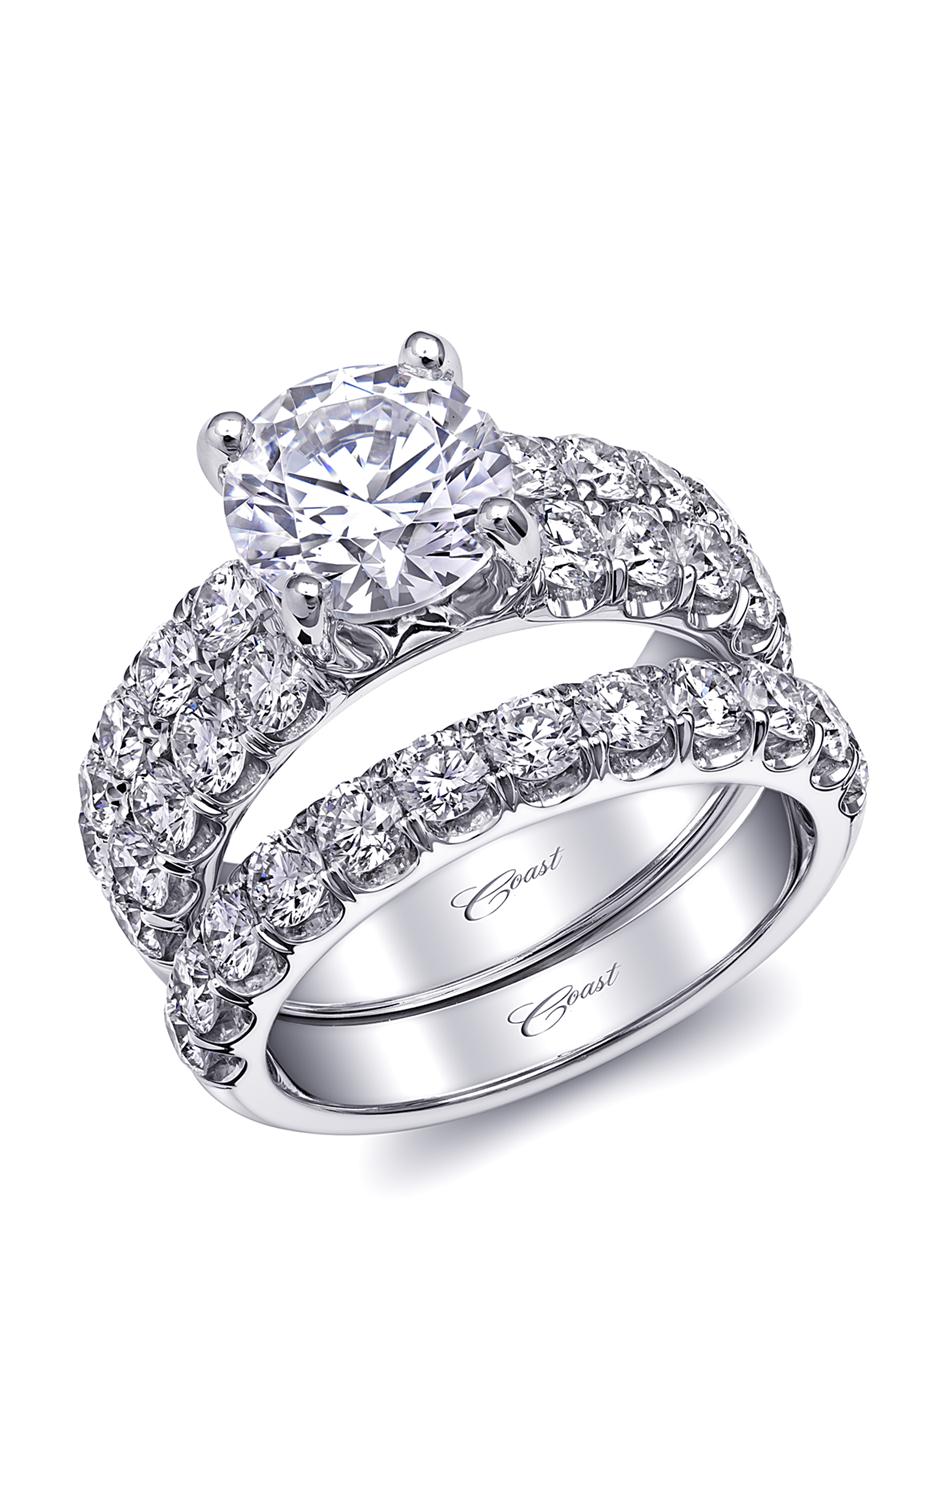 Coast Diamond Charisma LJ6023 WJ6023 product image